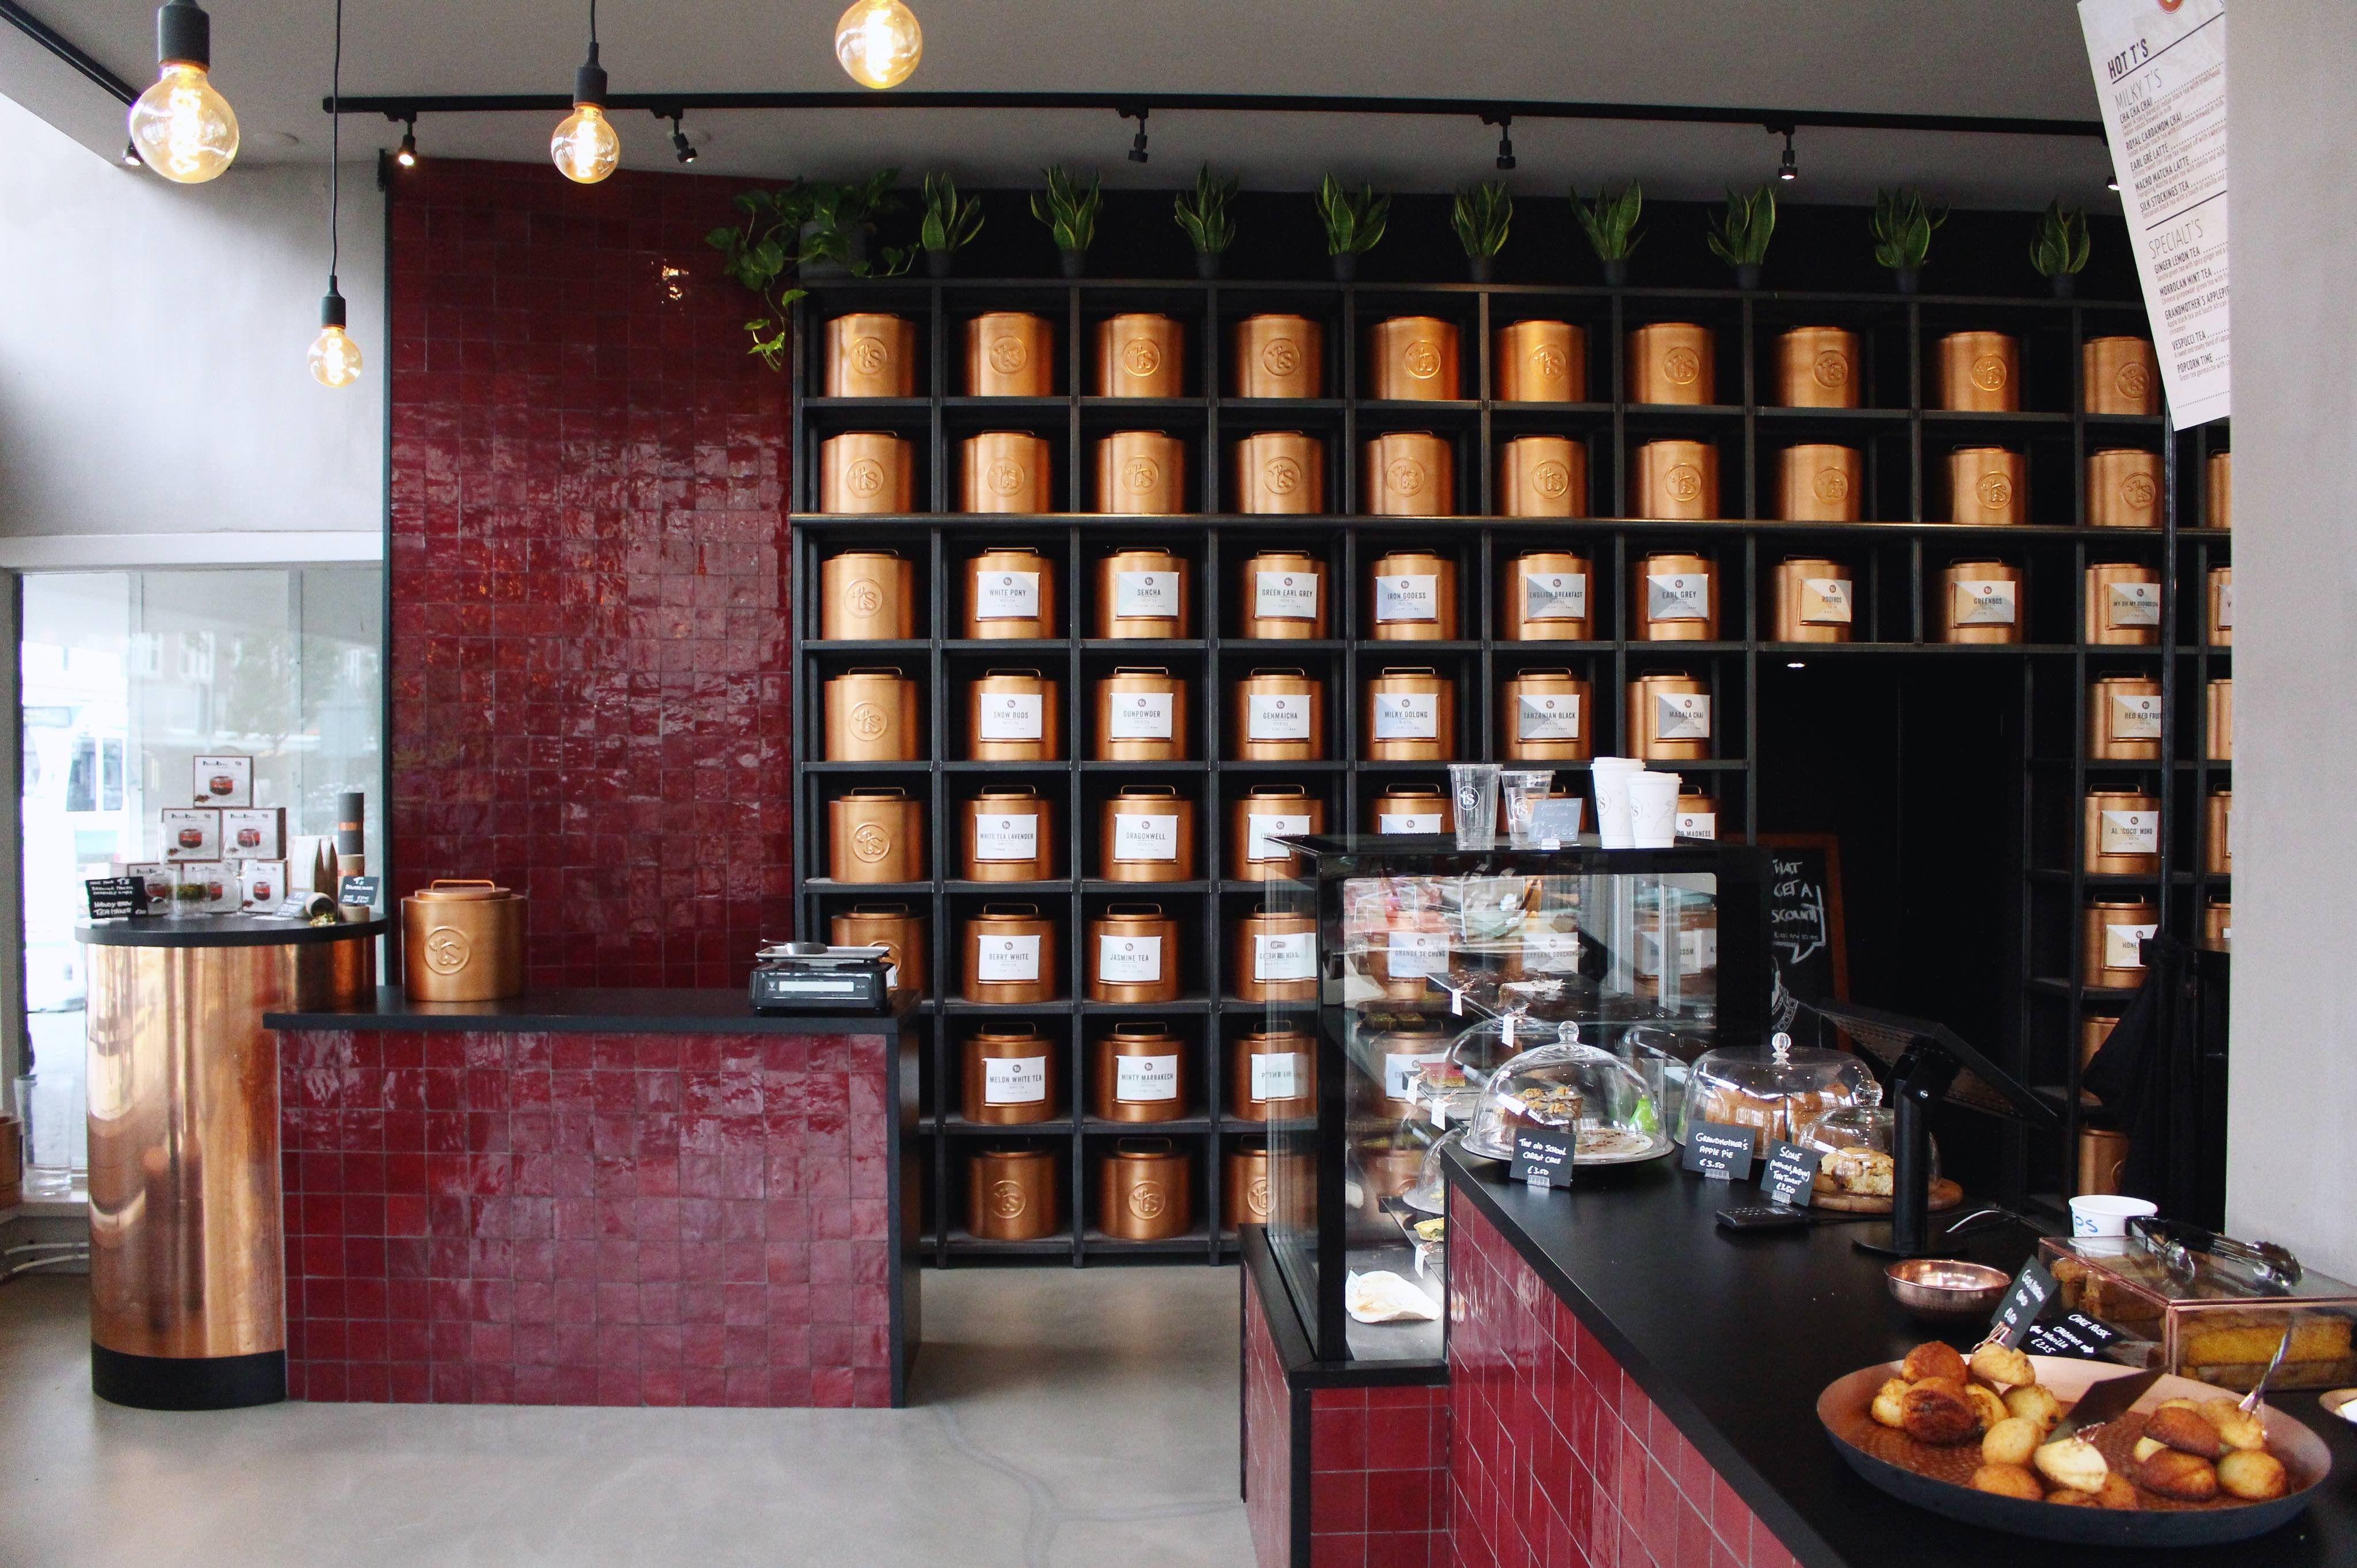 T's Teabar hotspot in Amsterdam - Only tea - Fashiable